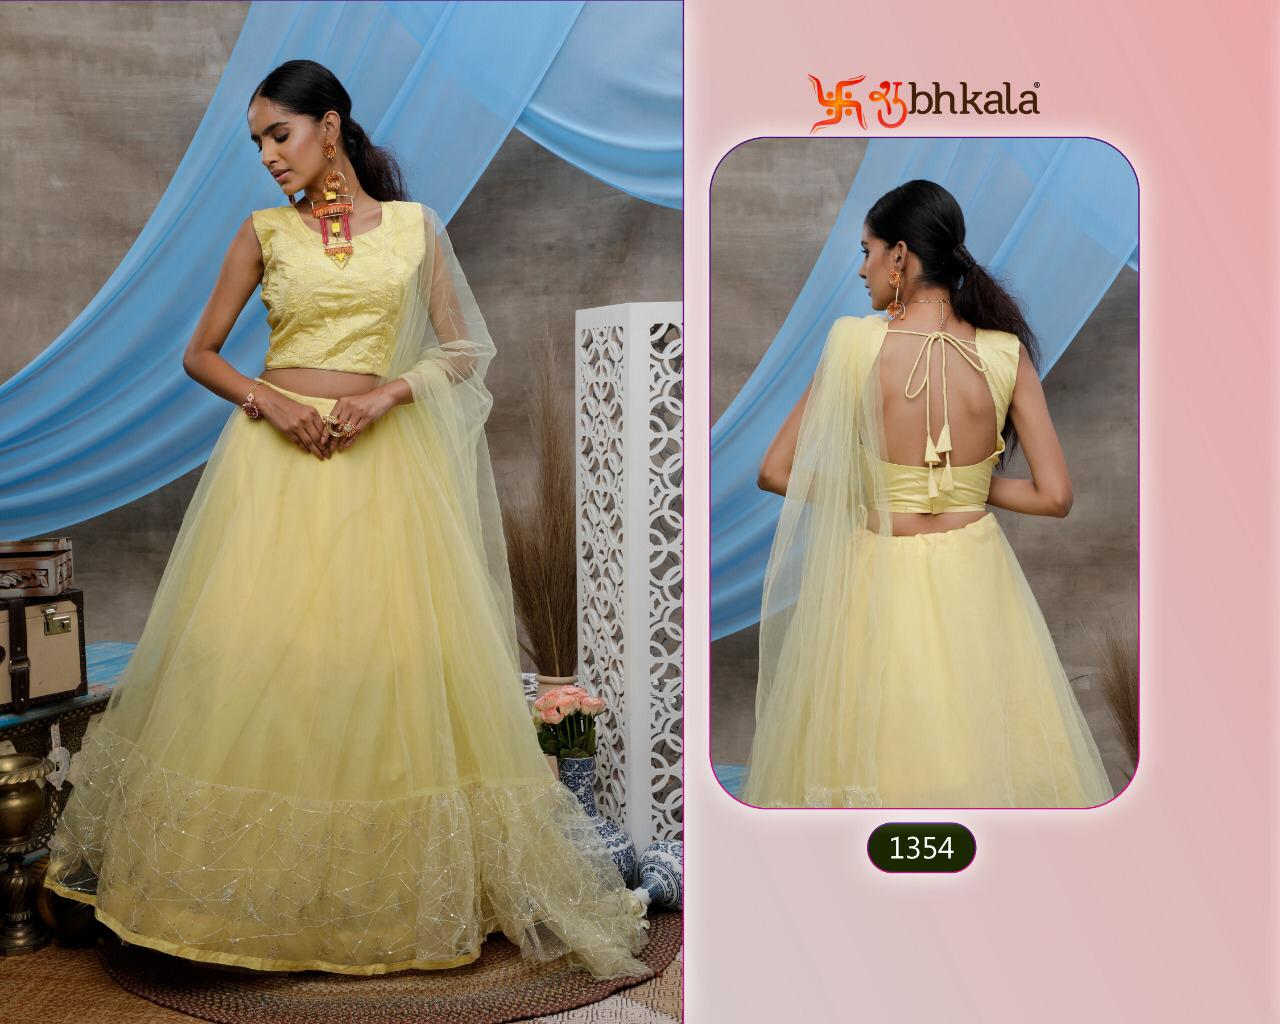 Khushboo Girly Vol 6 Designer 1351-1354 Series Soft Organza Net Lehenga Choli With Dupatta